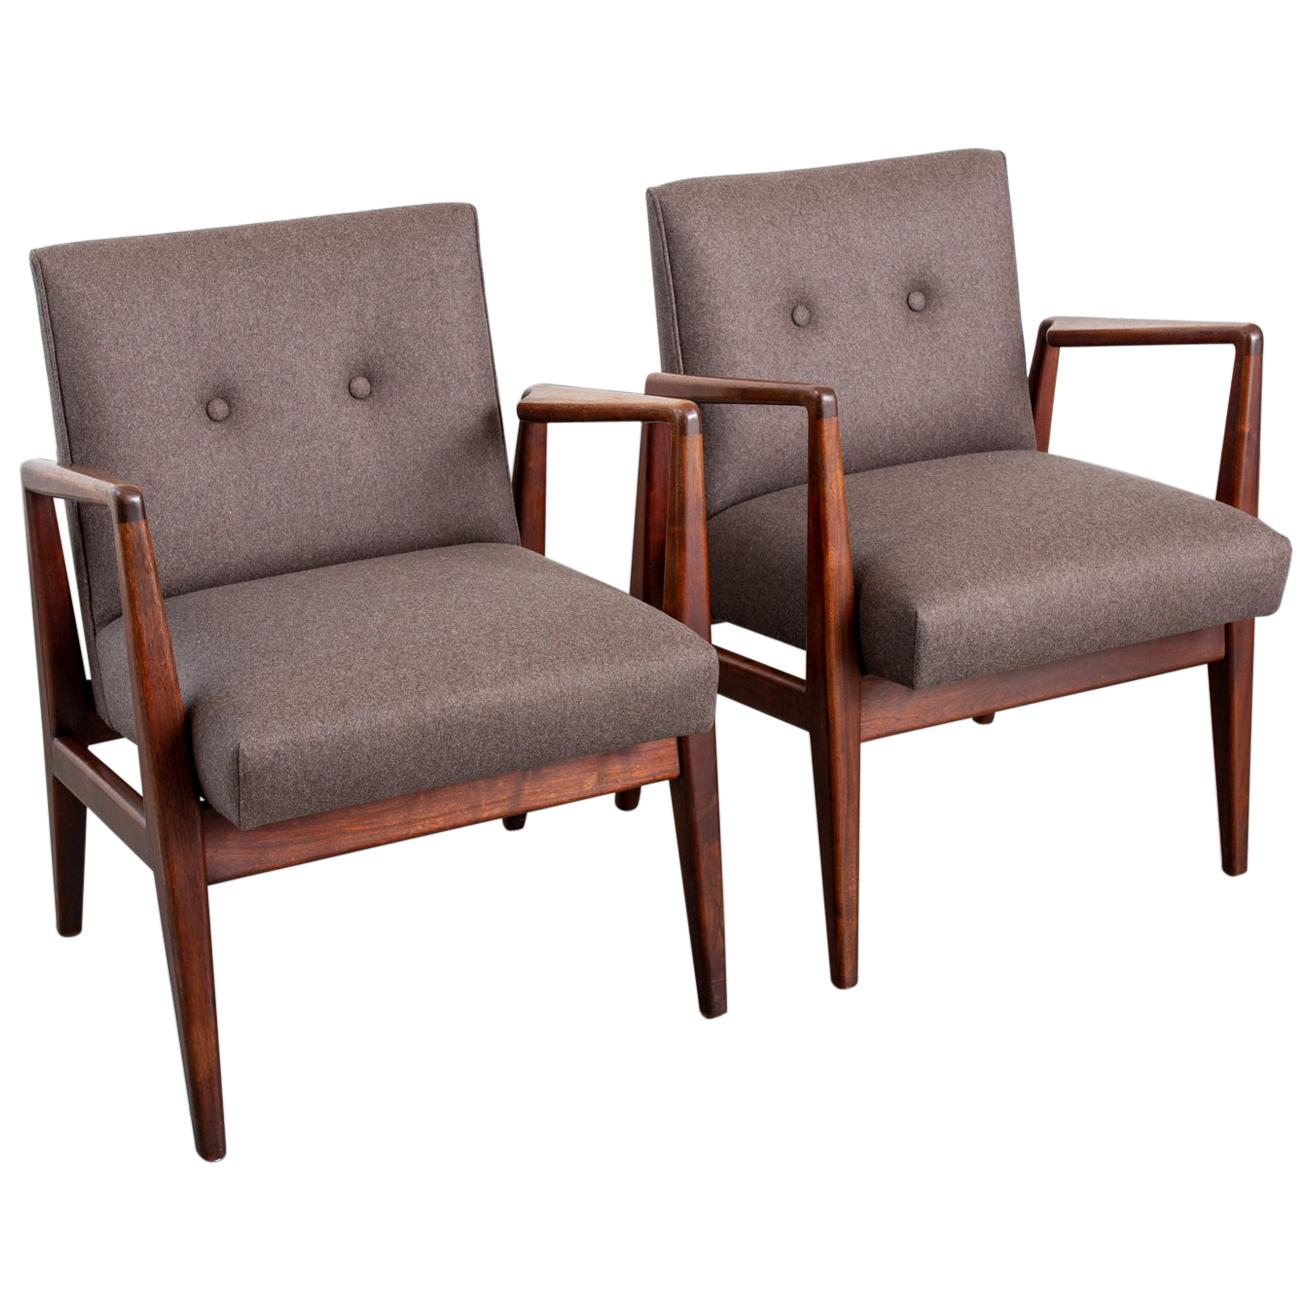 Pair of Jens Risom Mid-Century Modern Armchairs